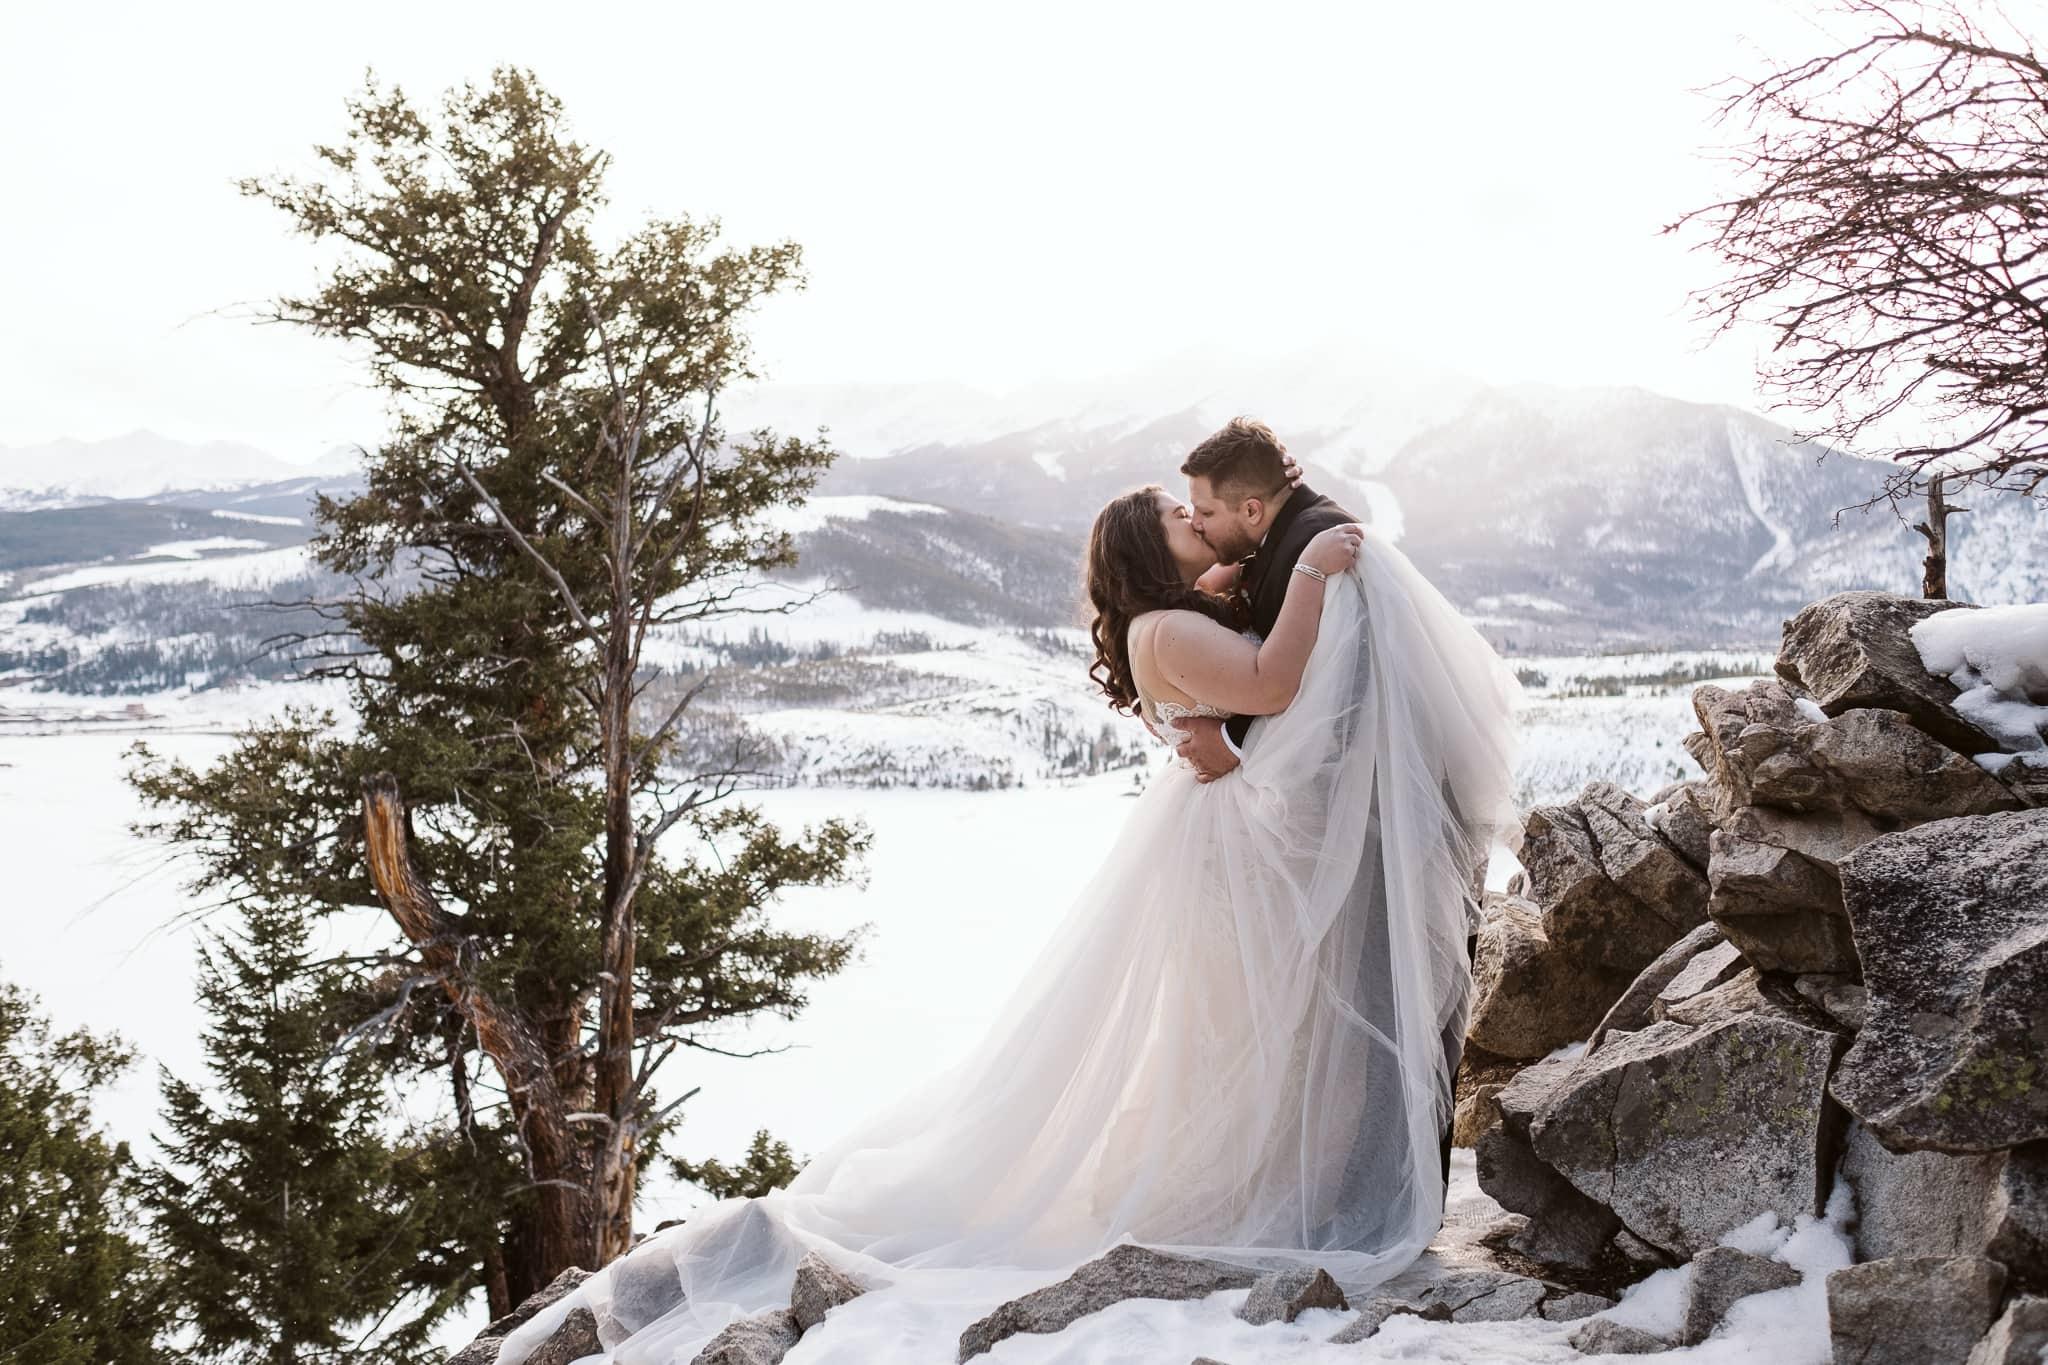 Winter elopement at Sapphire Point Overlook